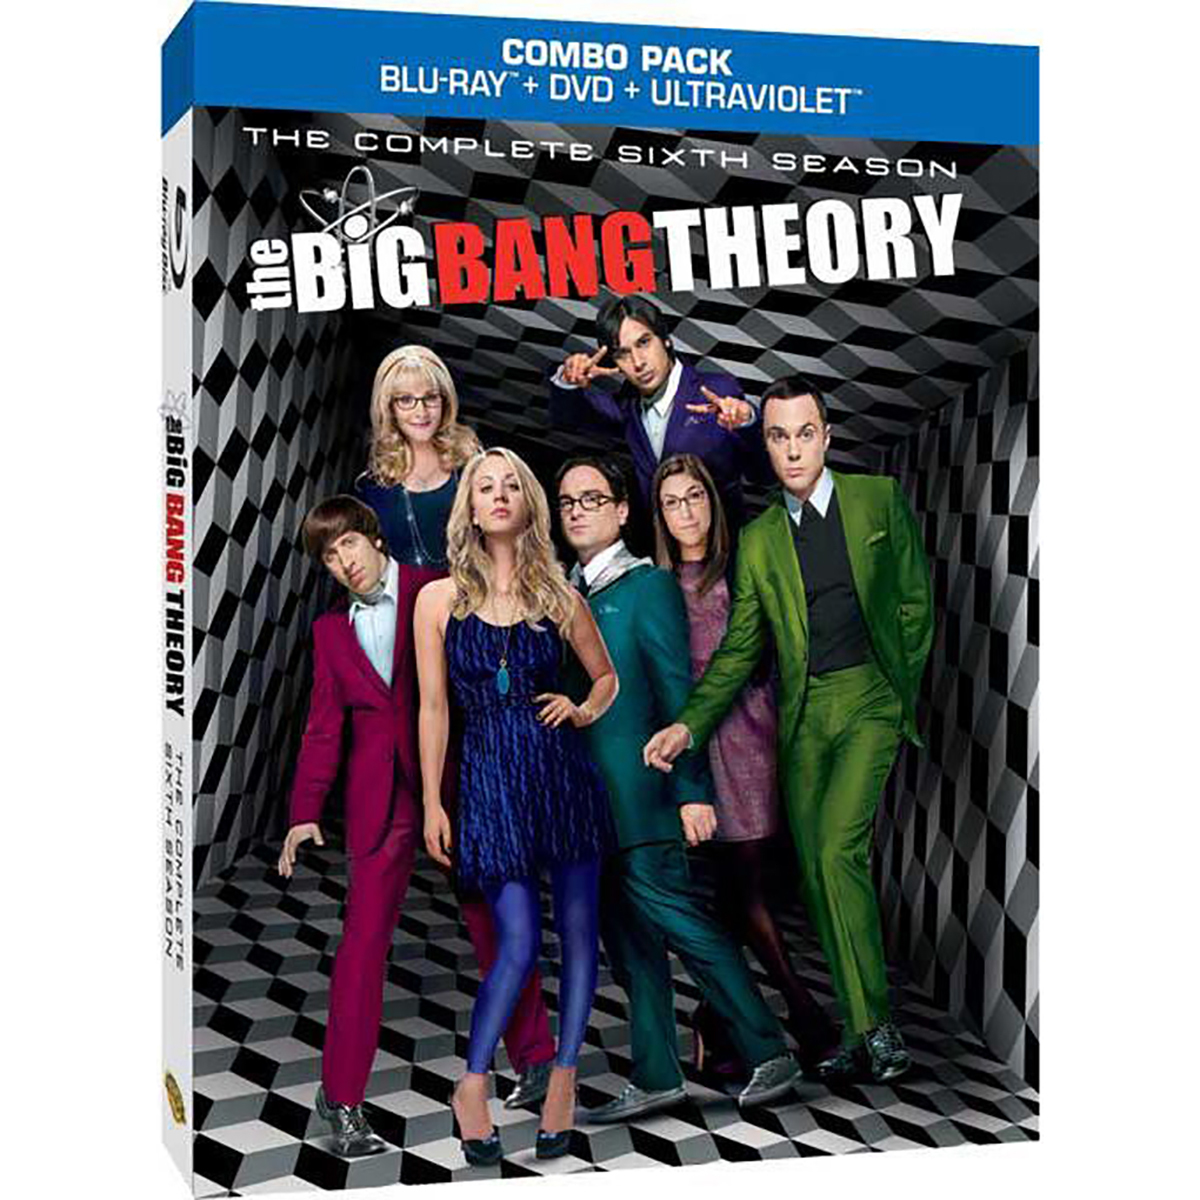 The Big Bang Theory: Season 6 Blu-ray -  DVDs & Videos 6445-513882